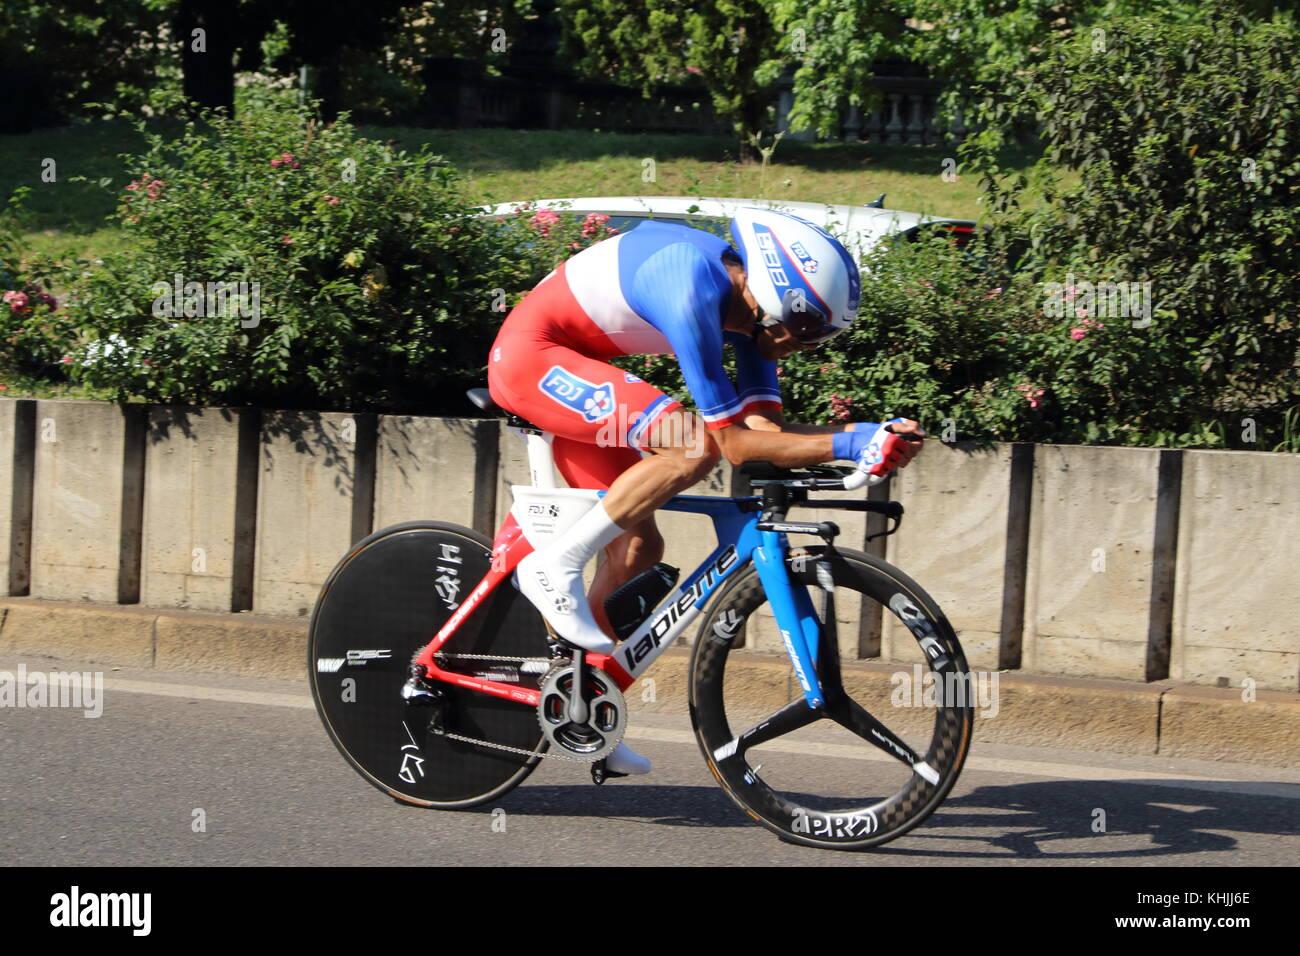 Thibaut pinot,equipo FDJ, contrarreloj, Monza-milano, Giro d'Italia 2017 Imagen De Stock